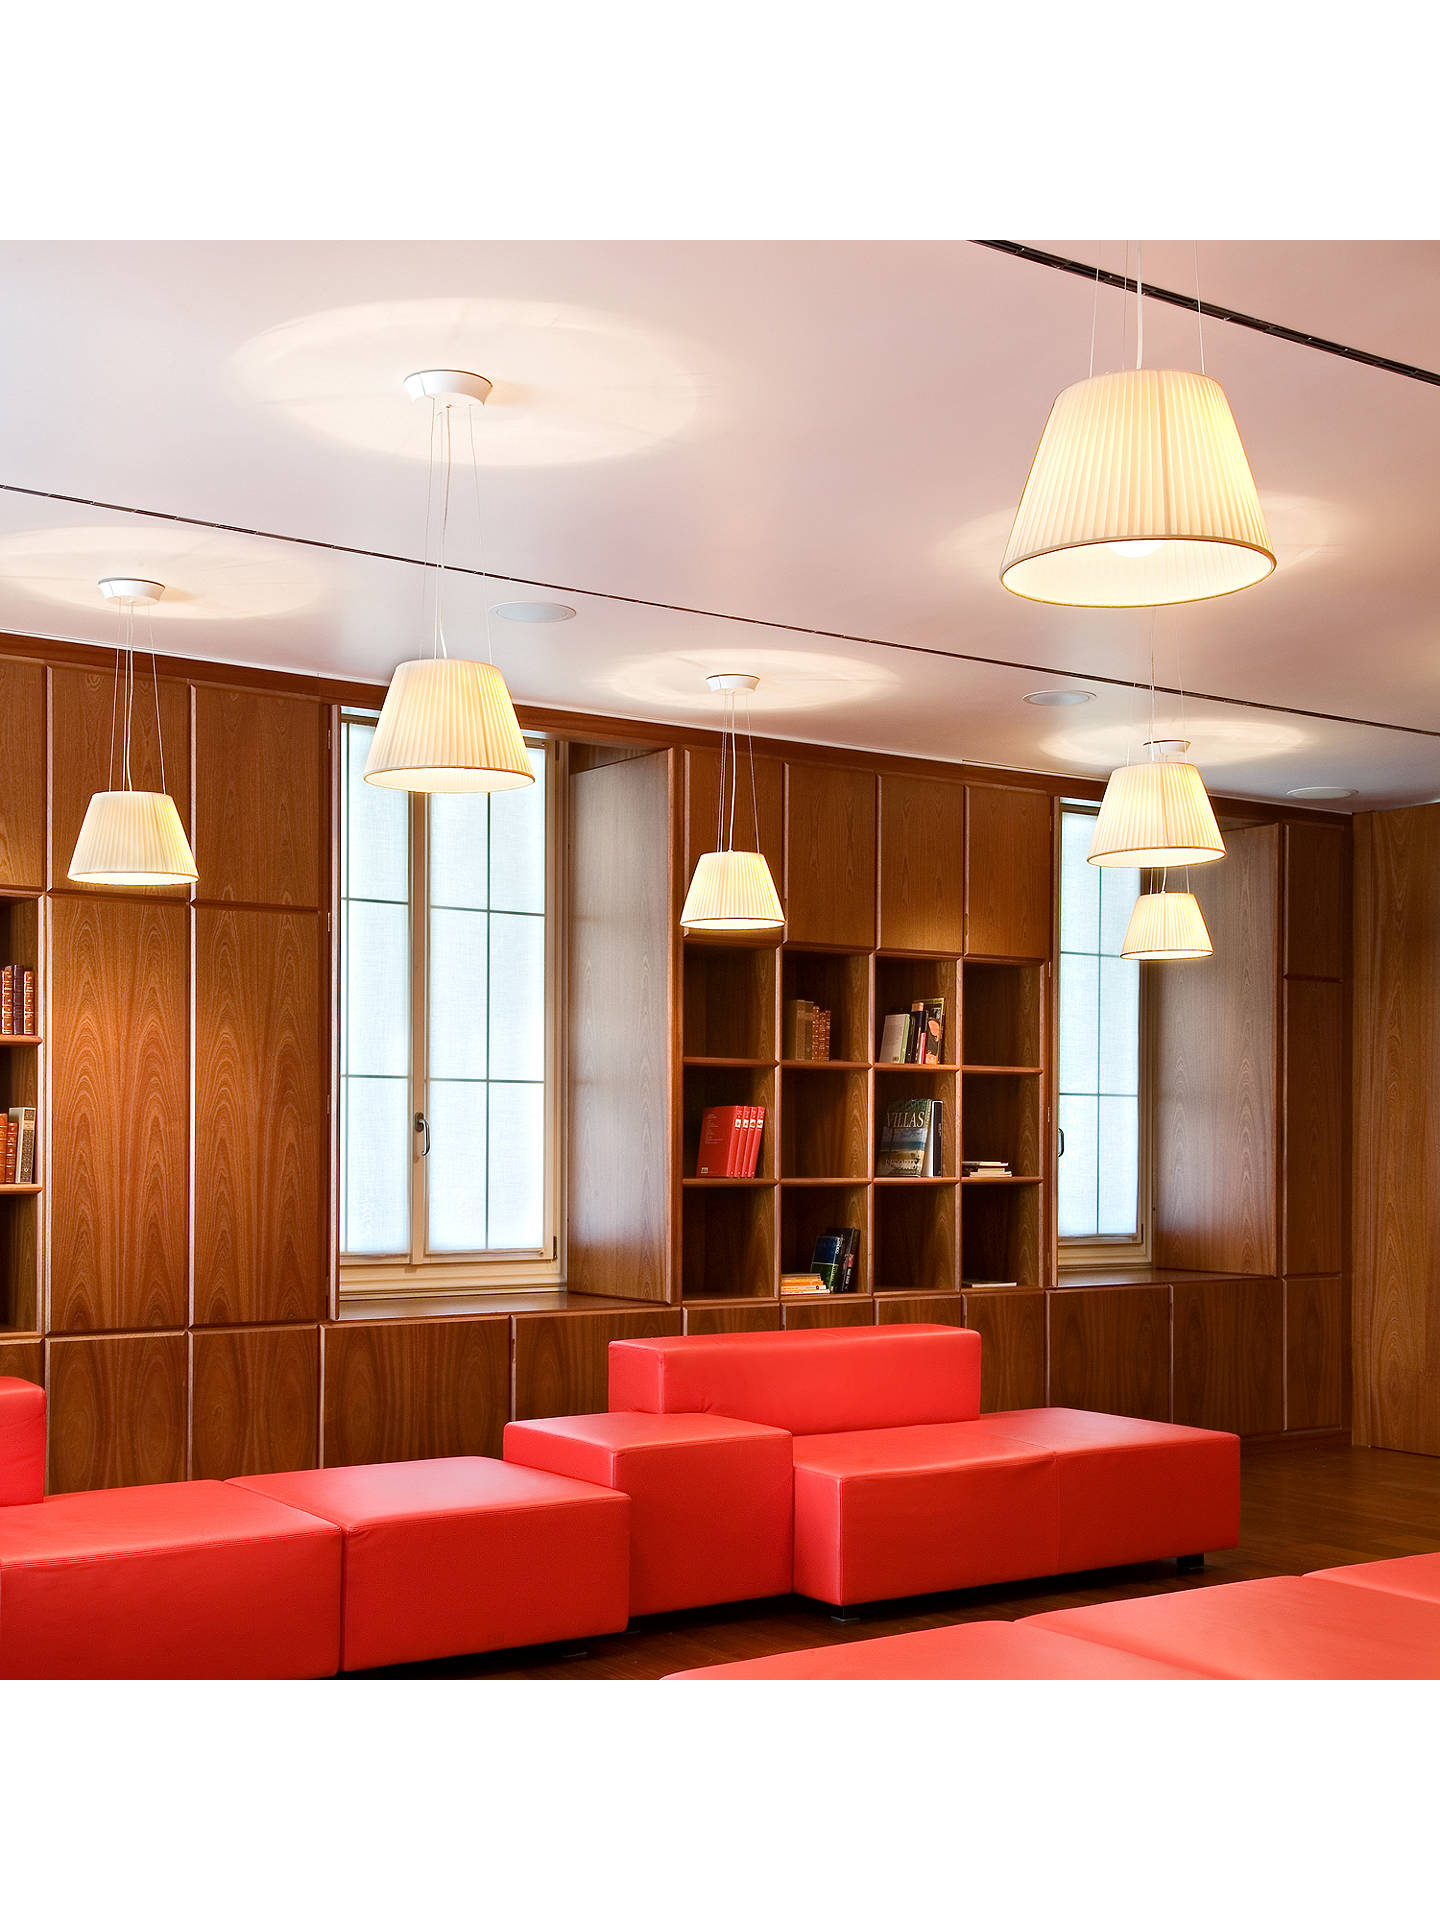 Flos romeo soft s2 ceiling light at john lewis partners for John lewis home design service reviews